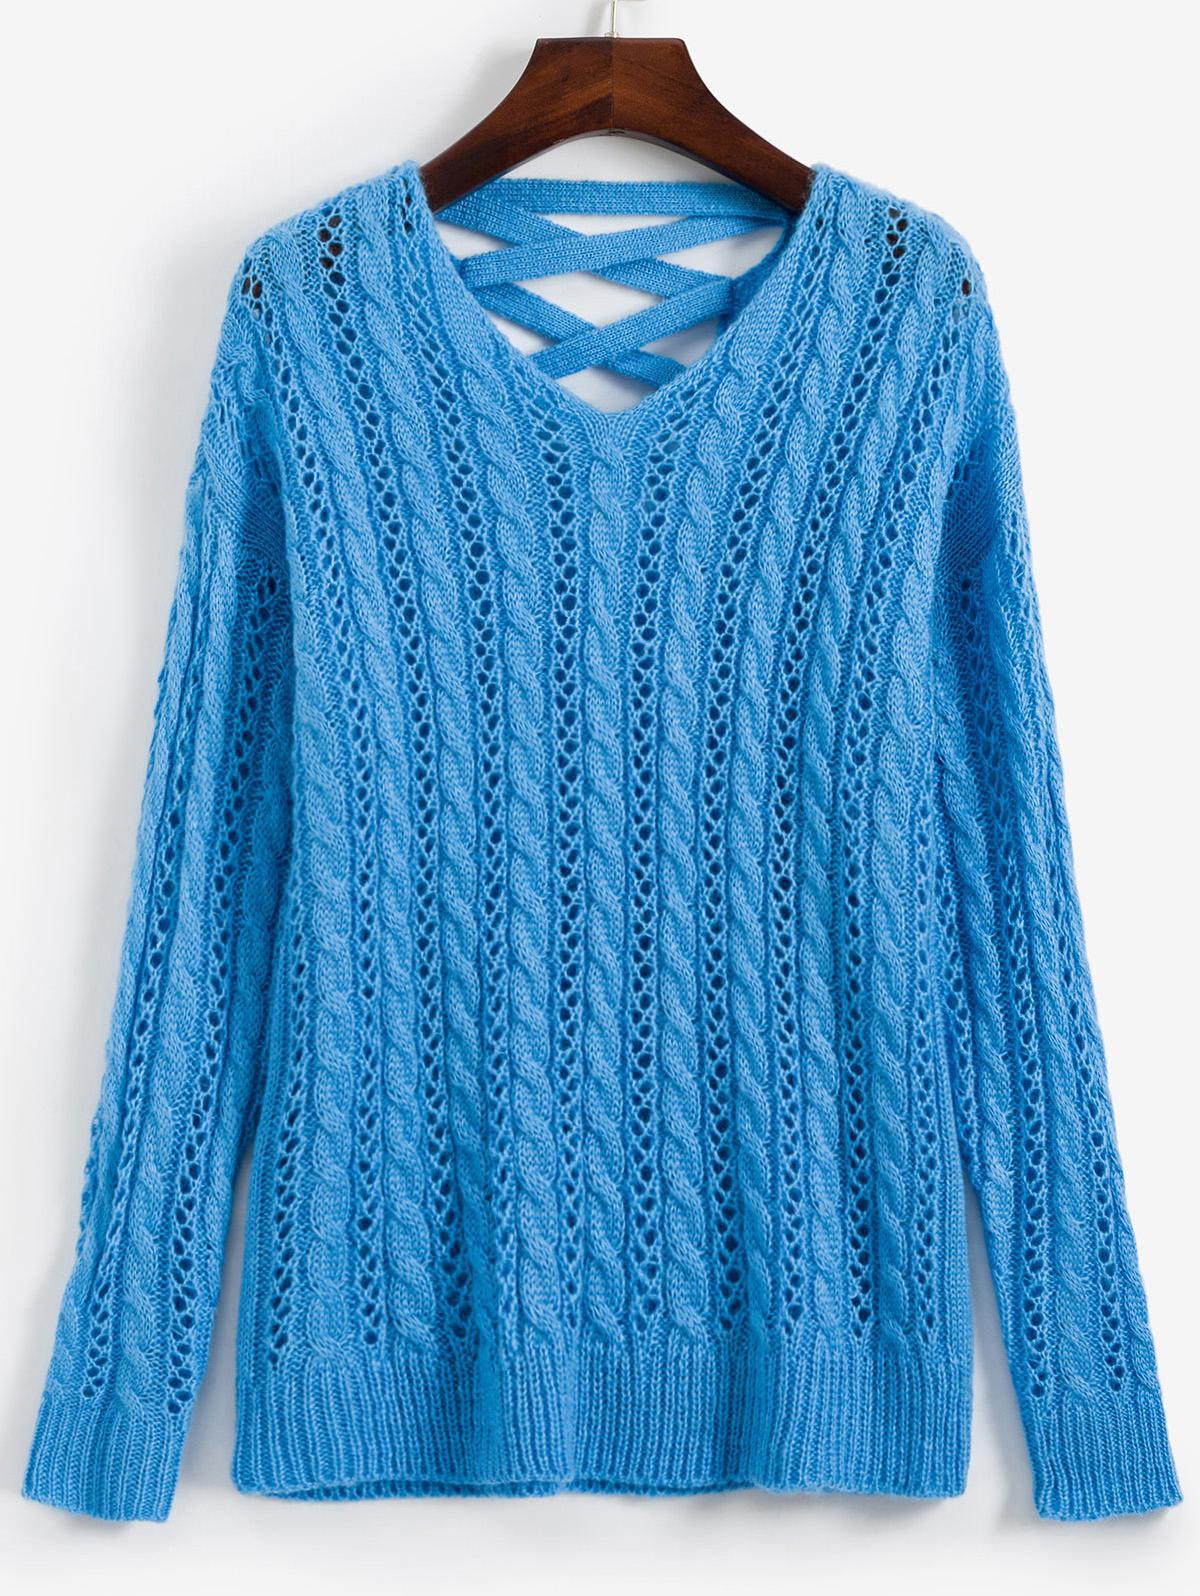 Lattice Open Knit Cable Knit V Neck Sweater